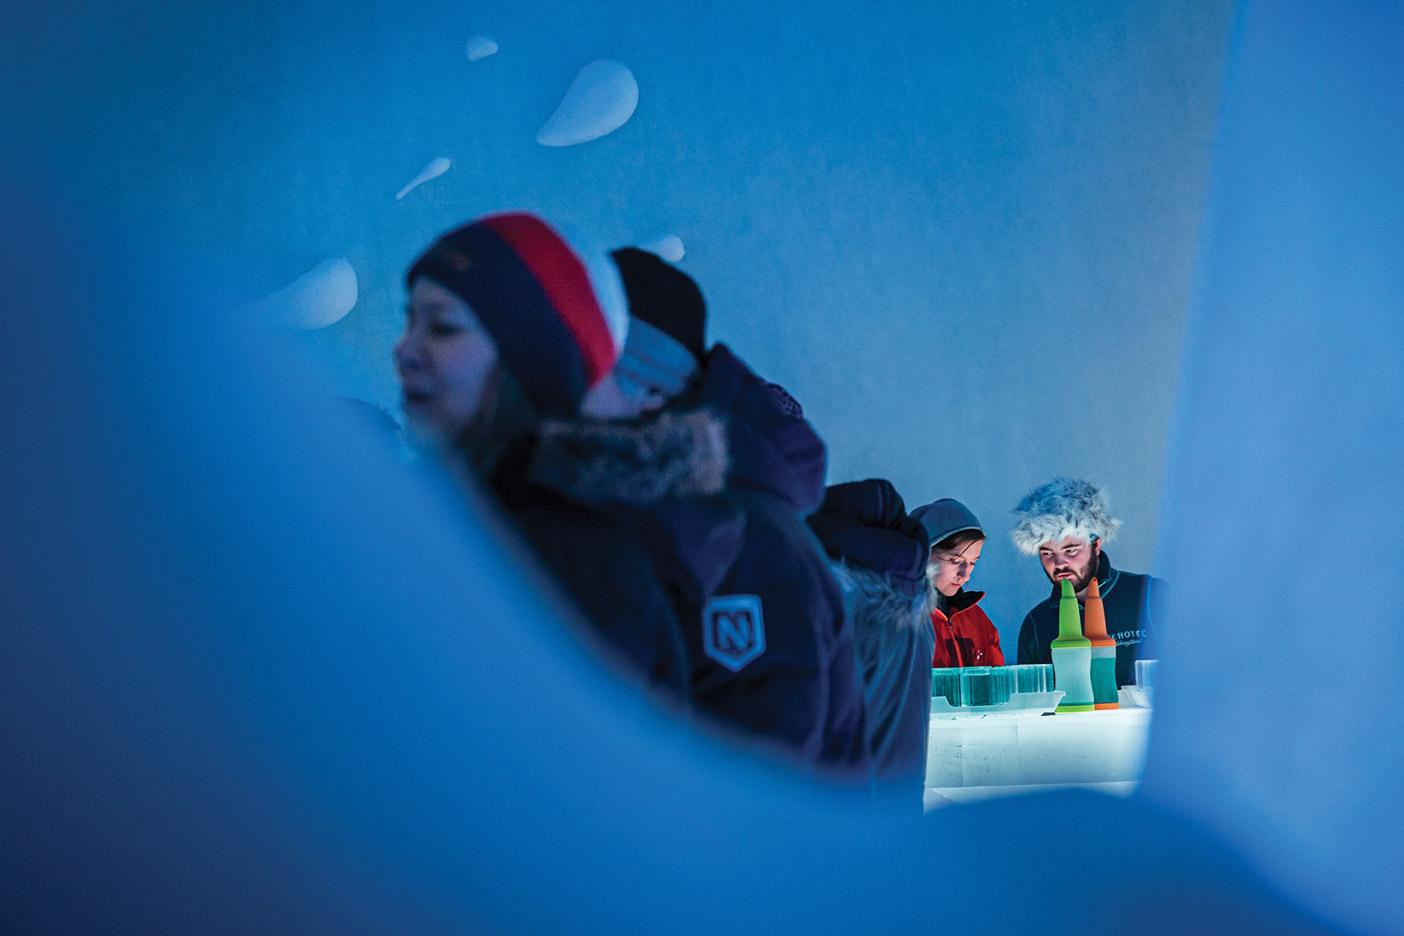 ICEBAR-BY-ICEHOTEL-JUKKASJéRVI_Photo-Paulina-Holmgren